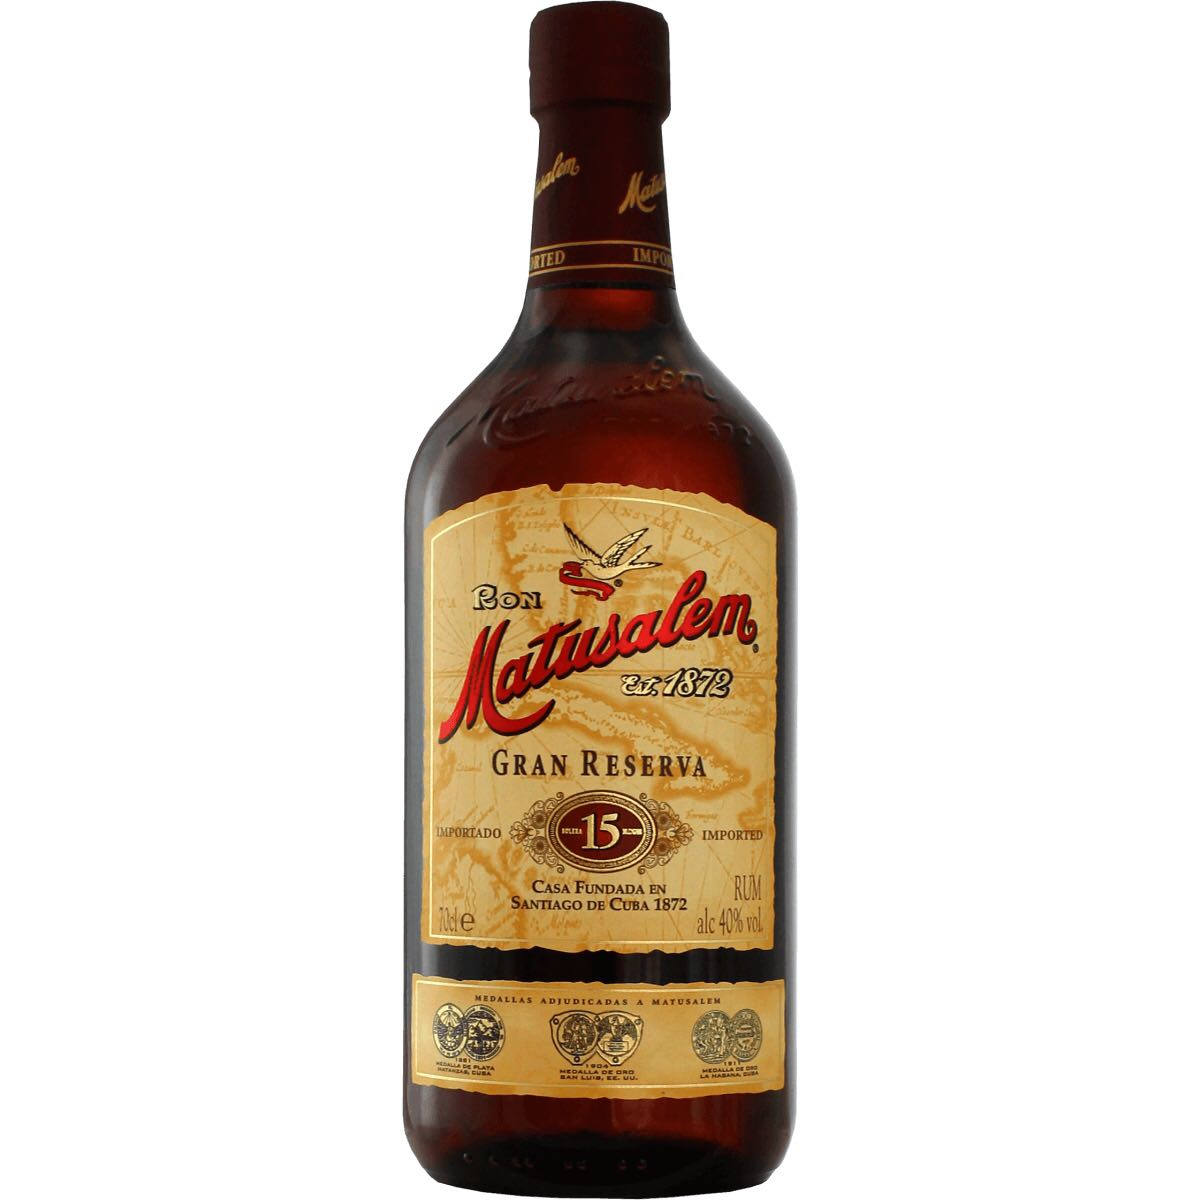 Bottle image of Gran Reserva 15 Años